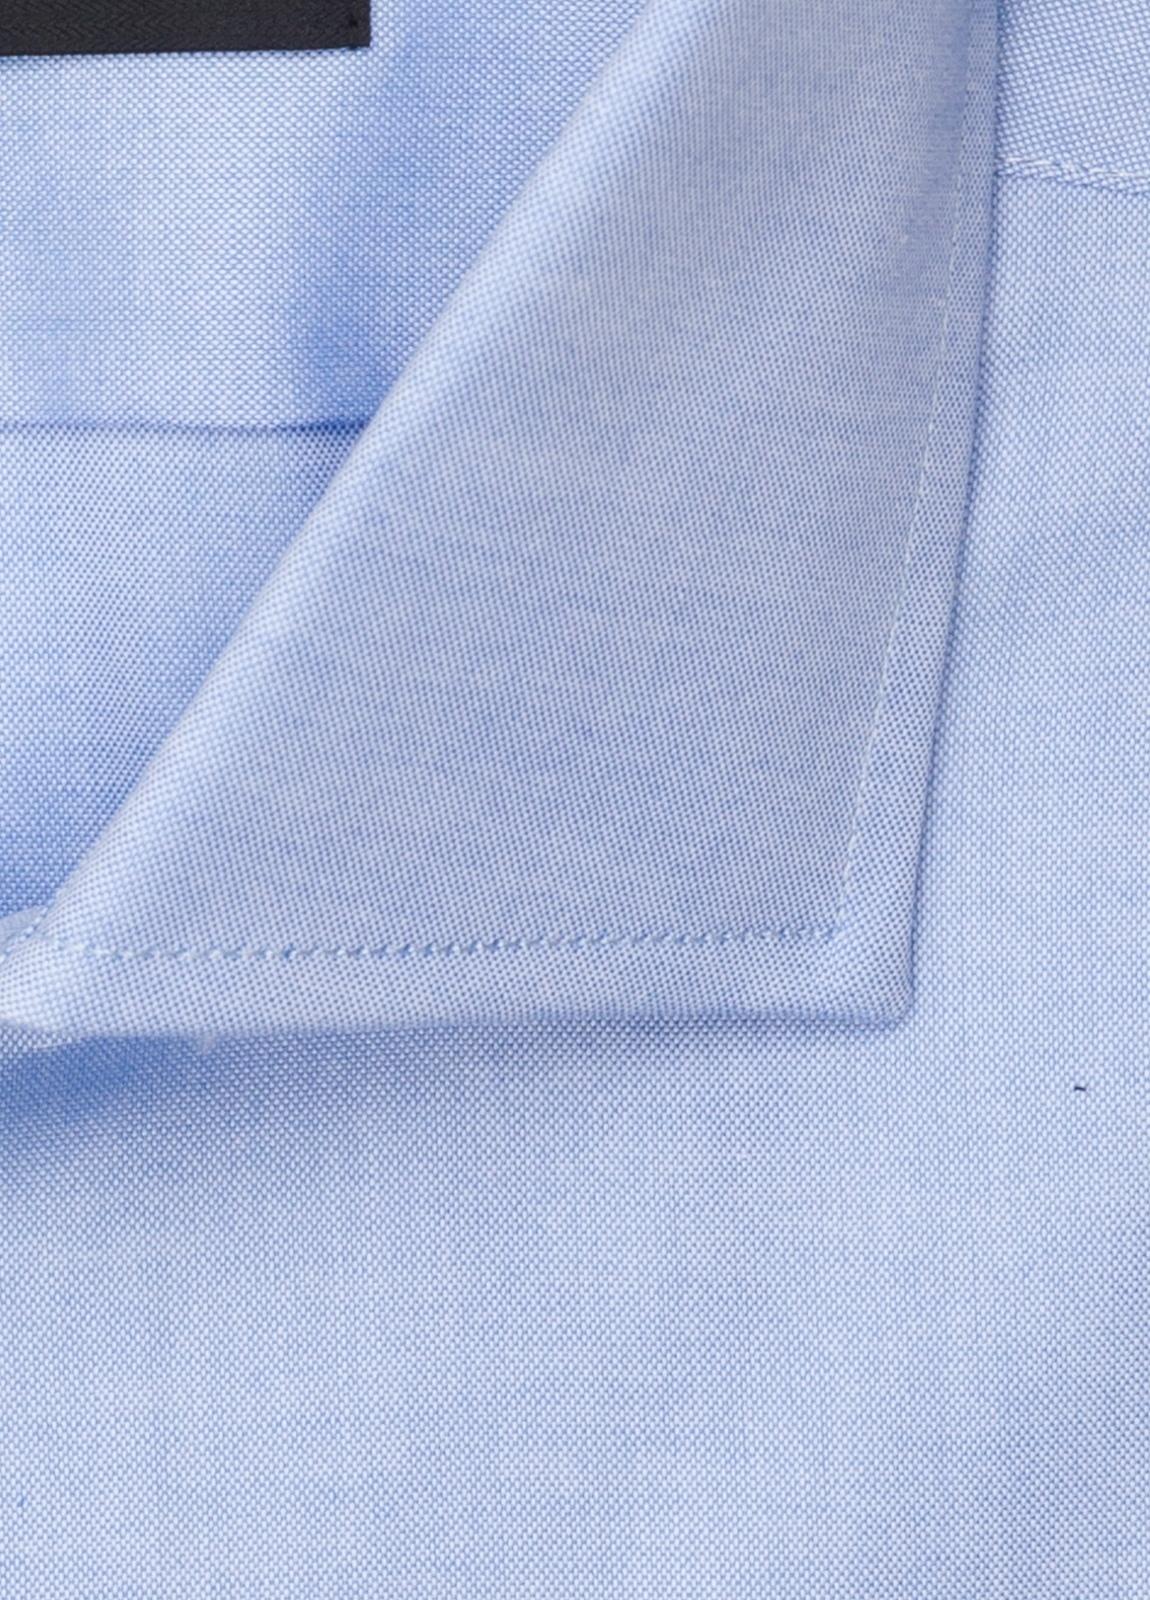 Camisa vestir FUREST COLECCIÓN REGULAR FIT cuello italiano Pin Point celeste - Ítem1